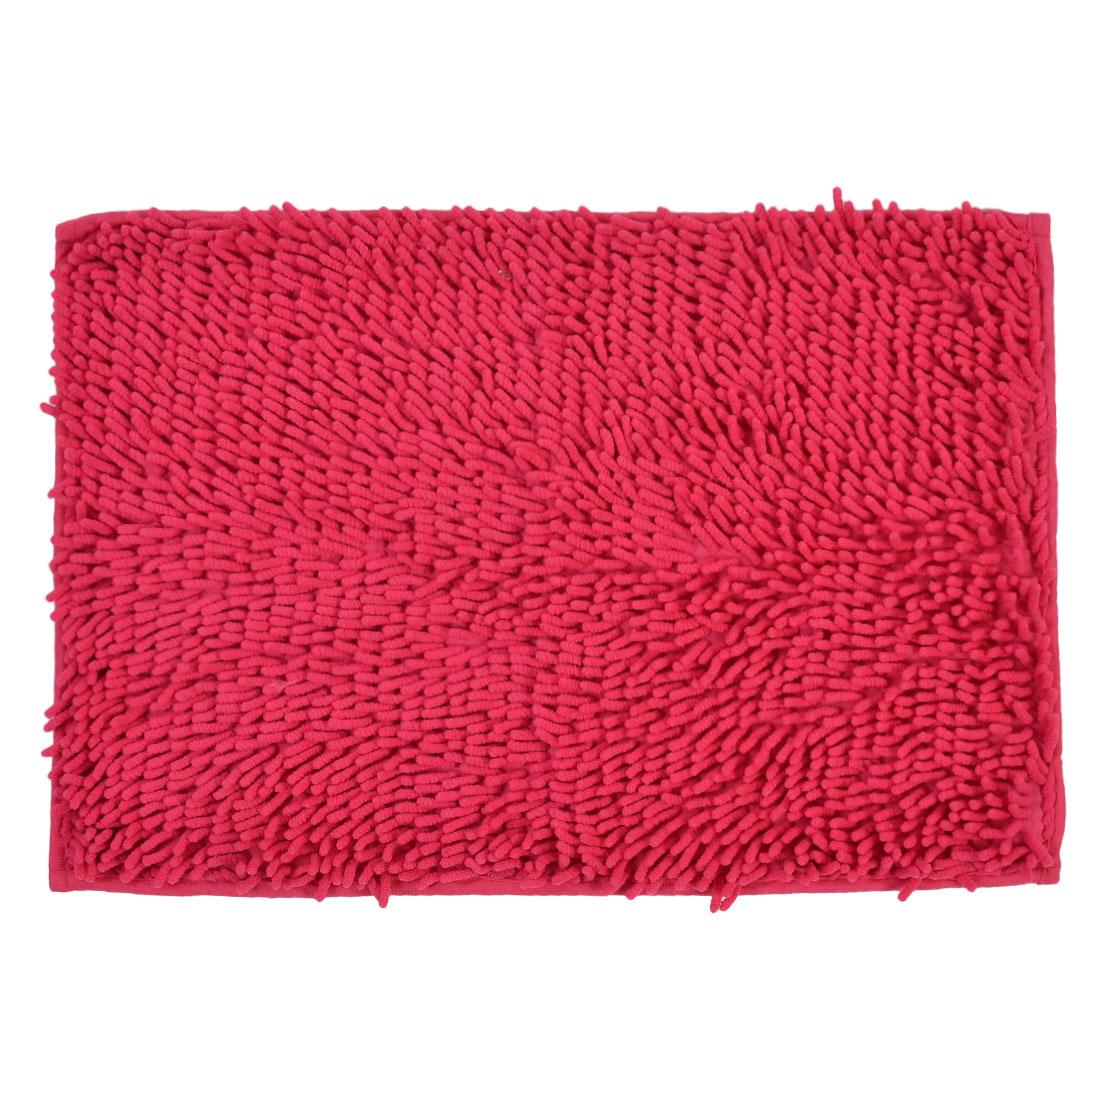 60cm x 40cm Fuchsia Polyester Absorbent Slip-resistant Pad Bath Mat Shower Rug